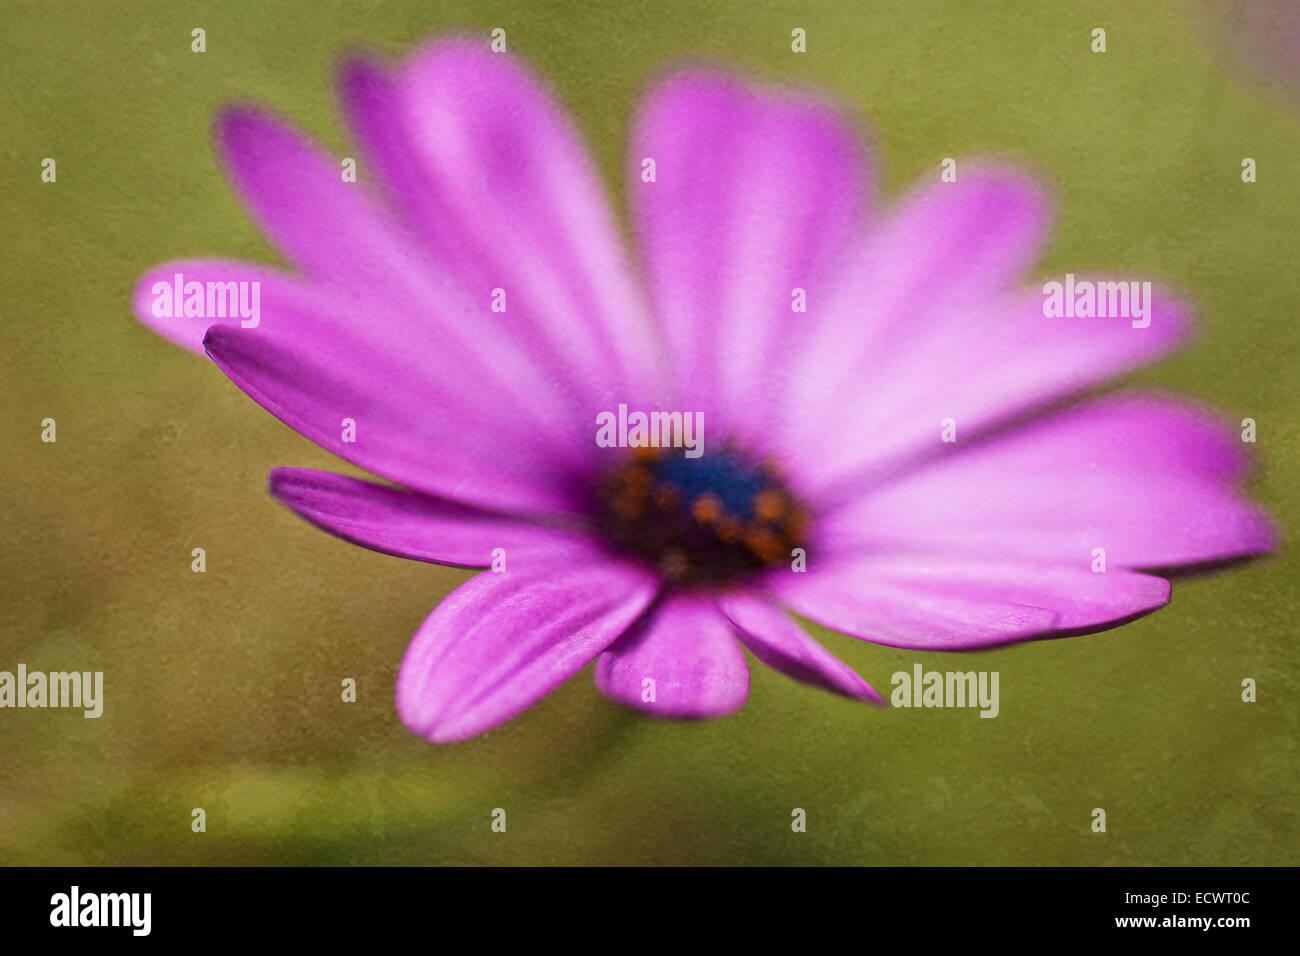 Purple Osteospermum flower with textured layer - Stock Image